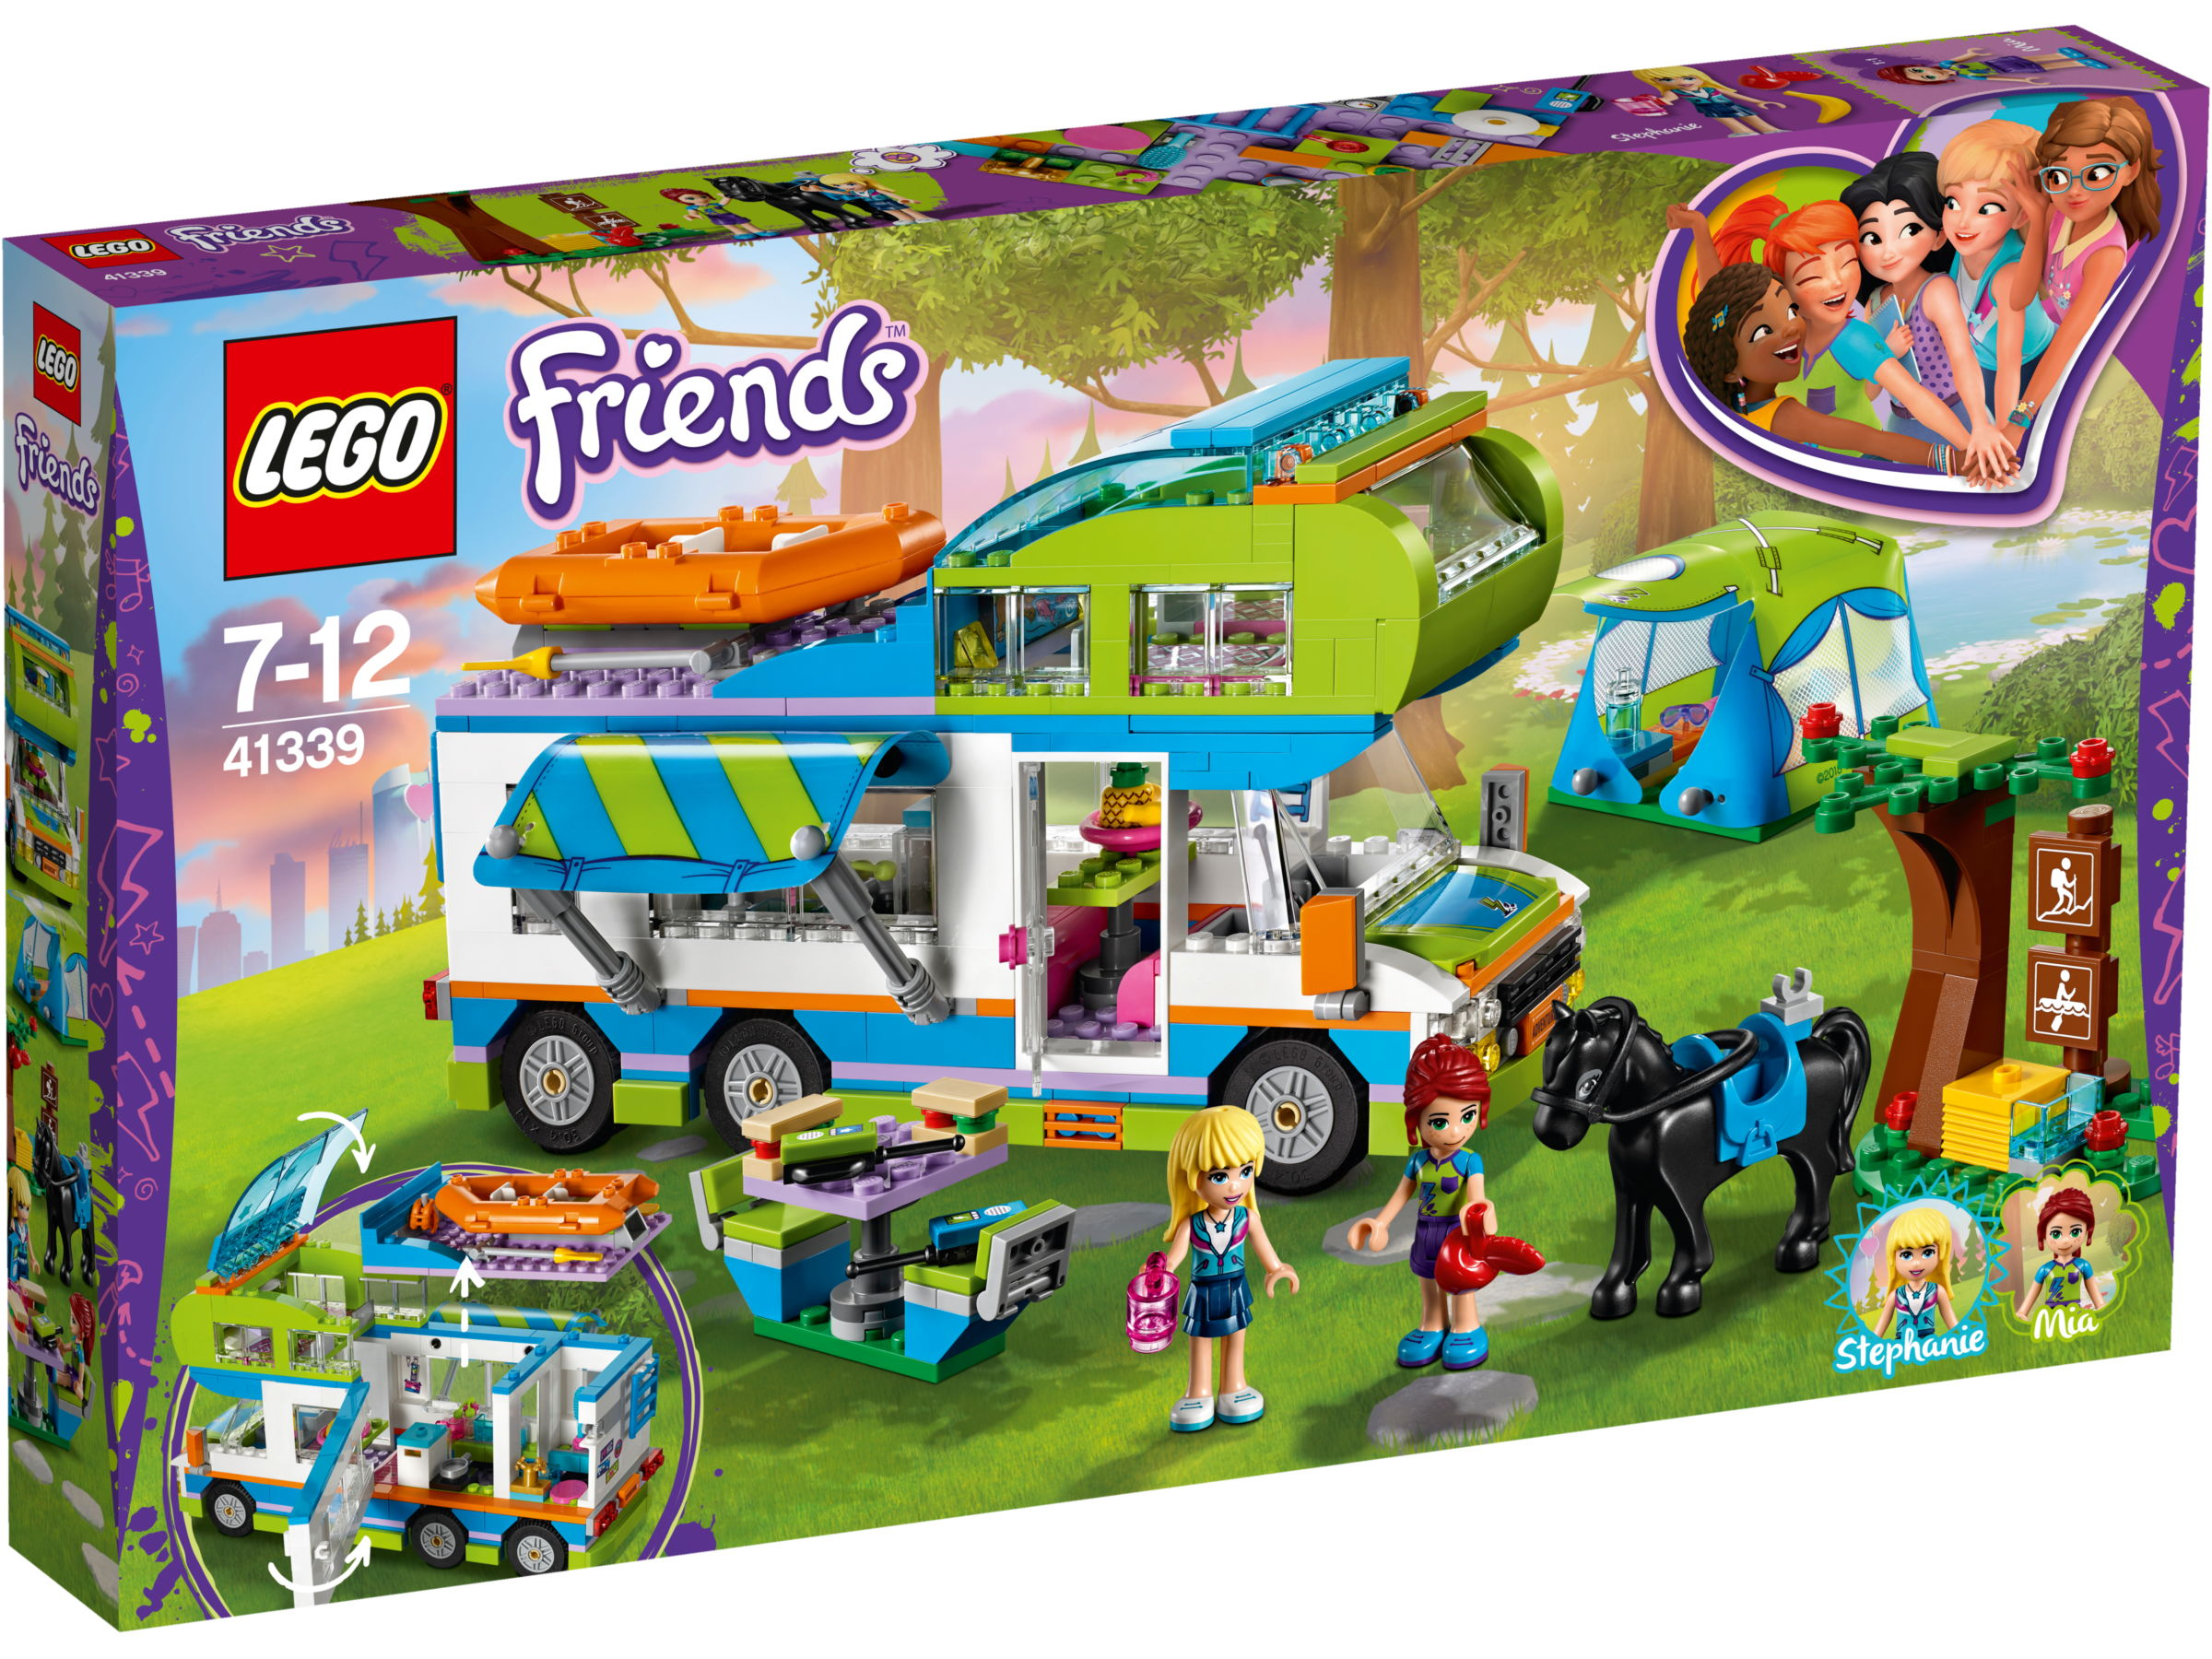 LEGO Friends 41339 Mia?s camper